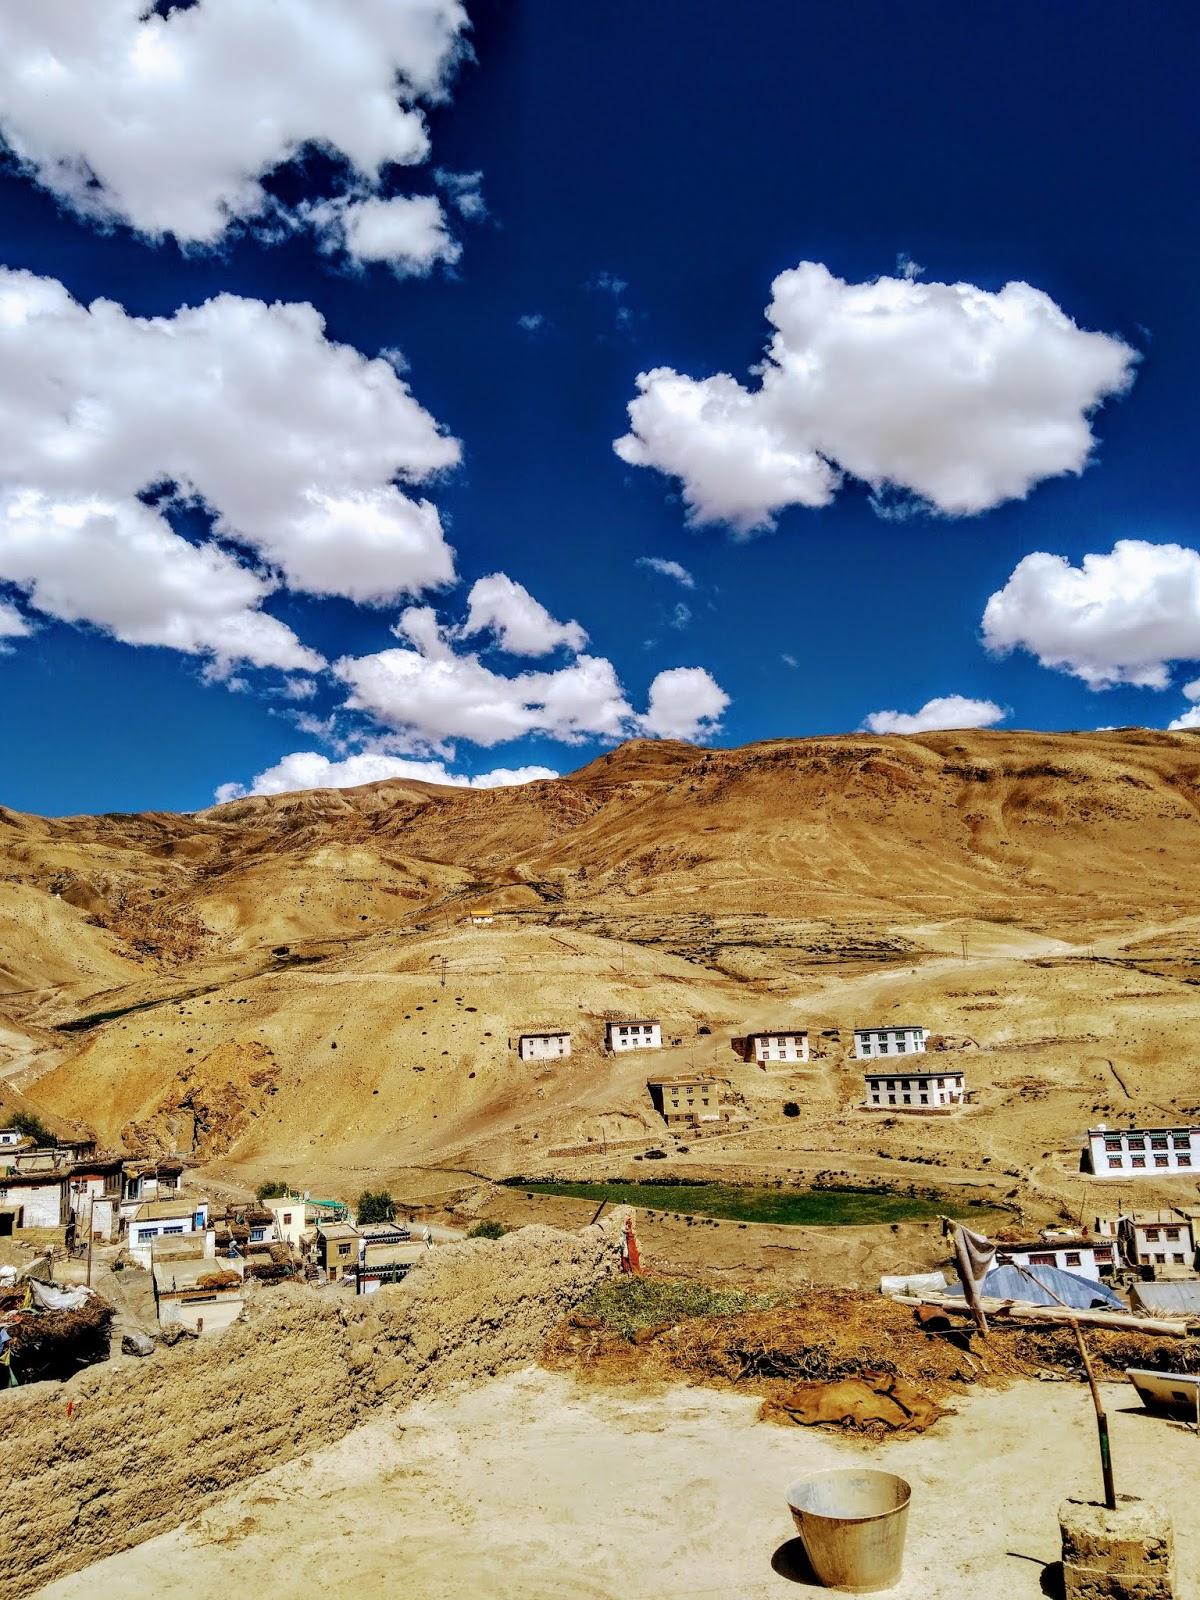 Kibbar village